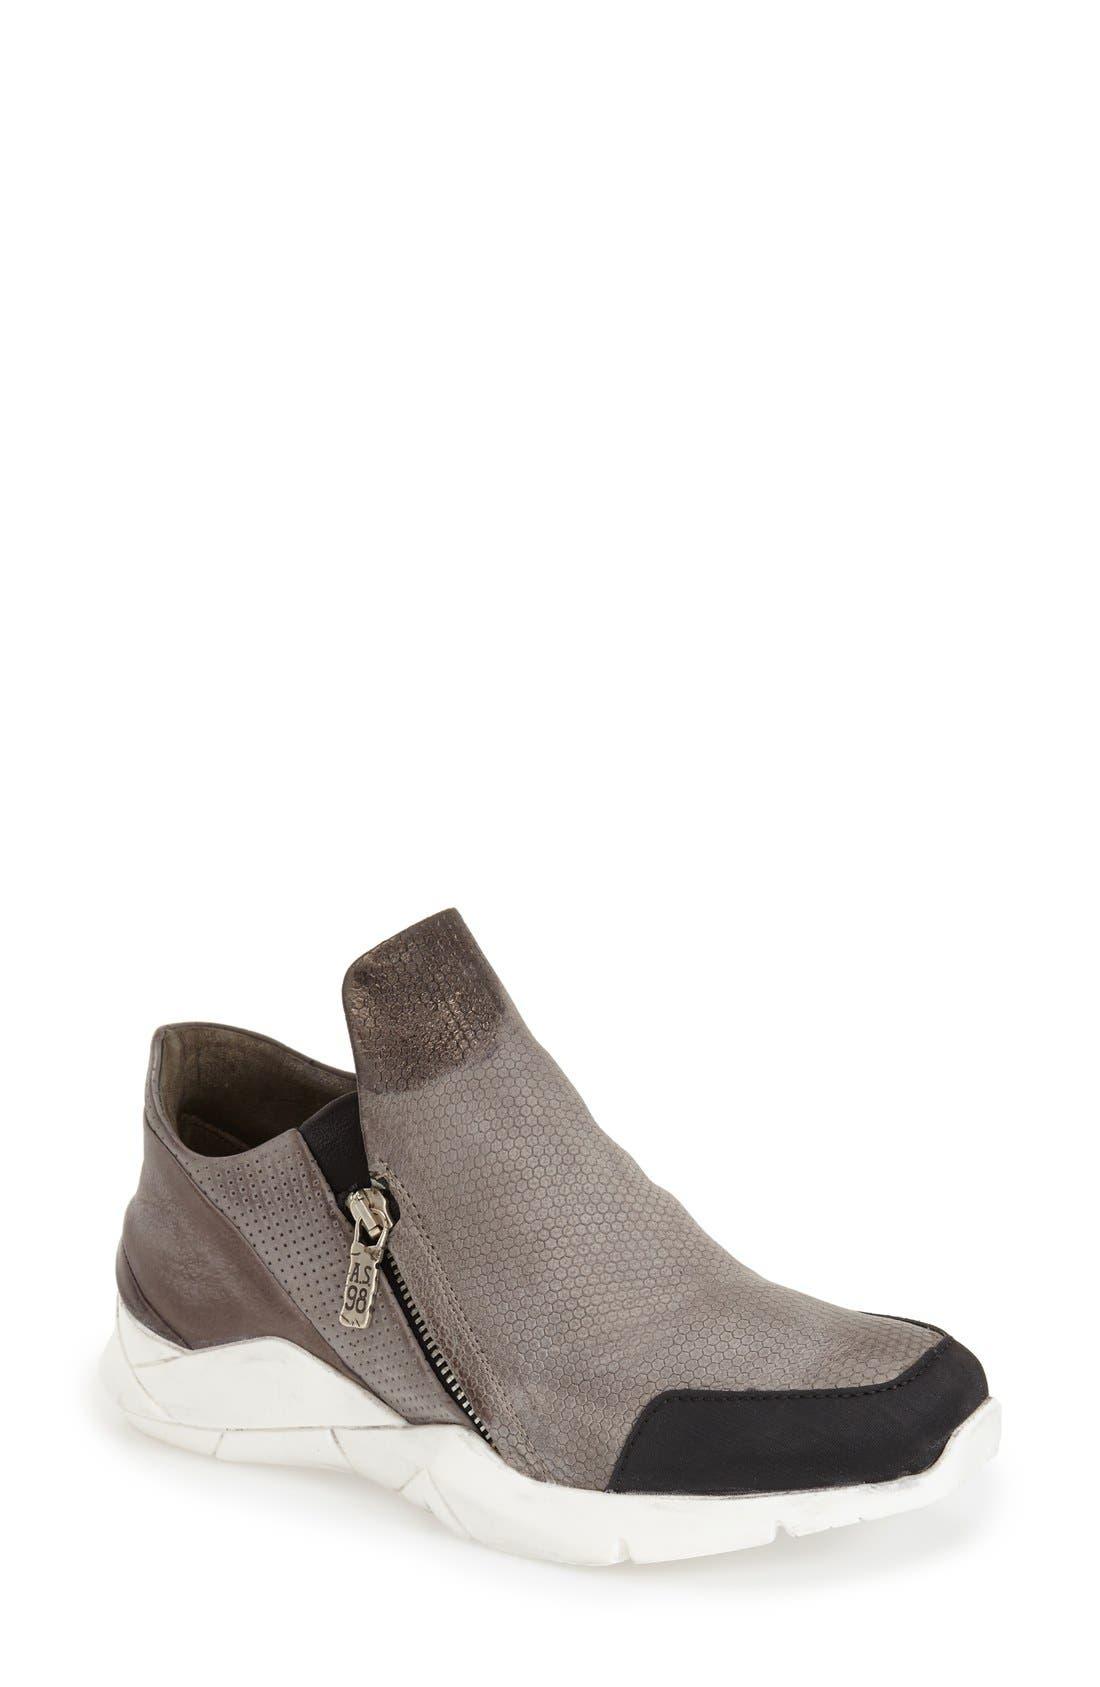 Alternate Image 1 Selected - A.S.98 'Bertie' Sneaker (Women)